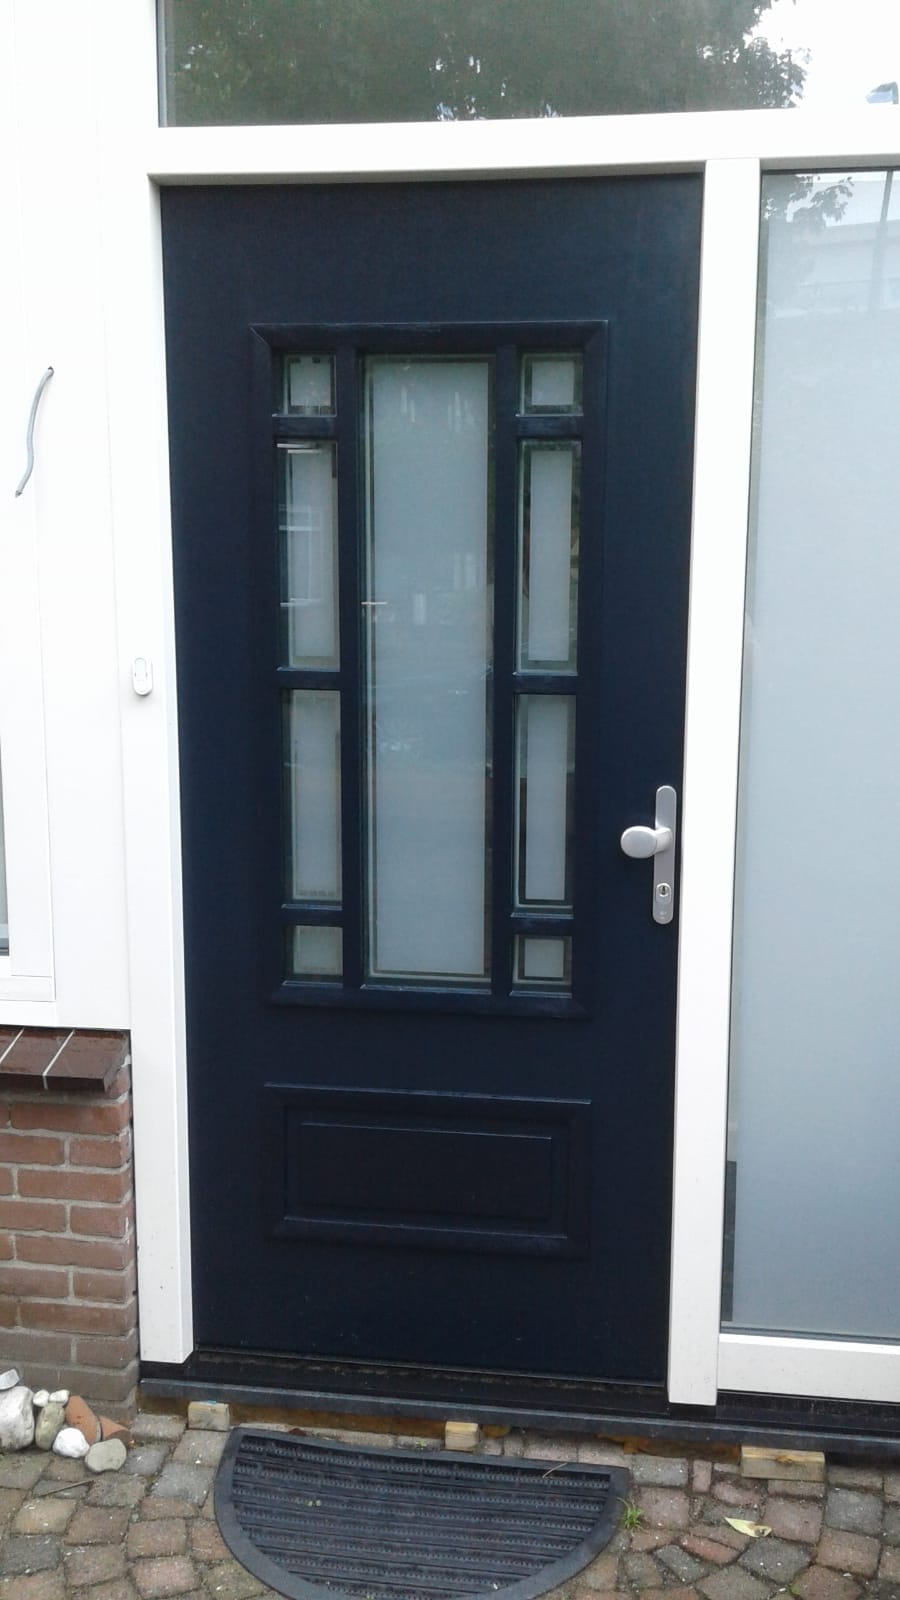 Mooie voordeur gemonteerd te Doorn!